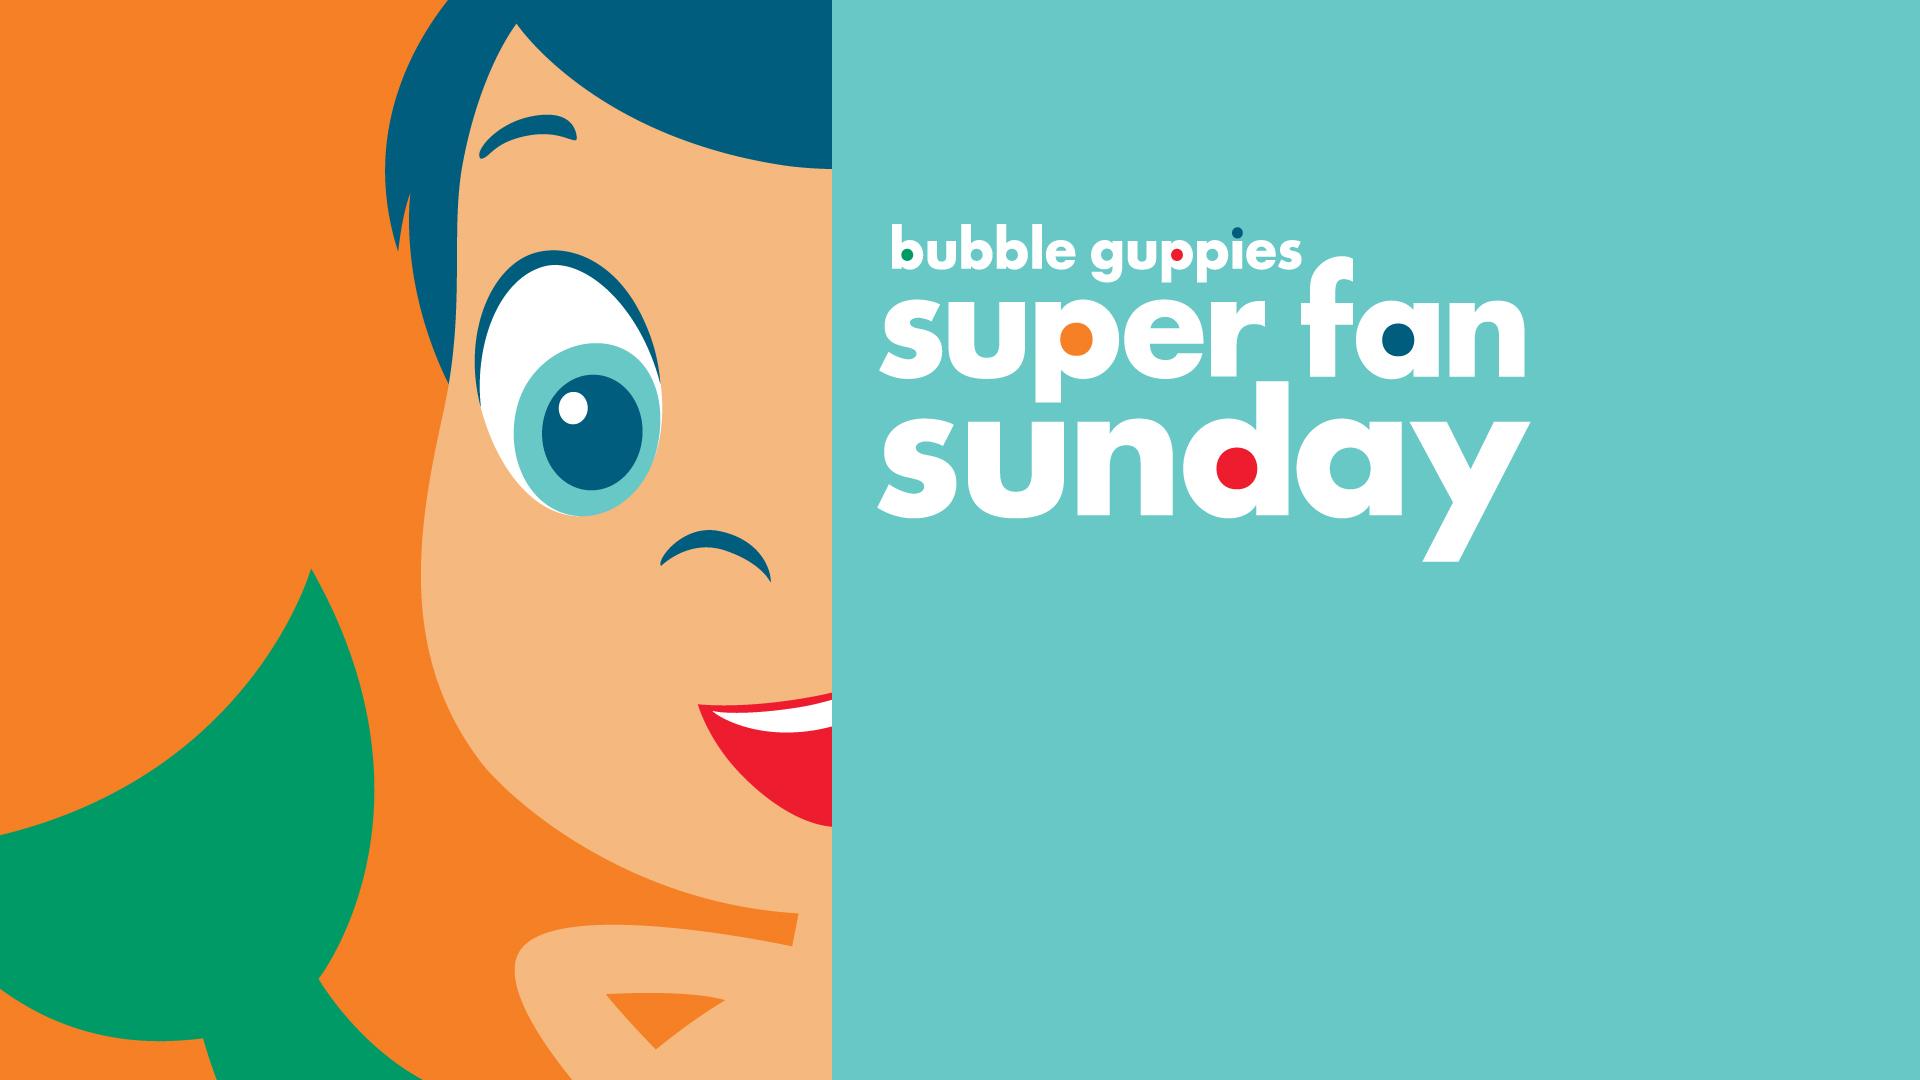 SuperFanSunday_BG_Title.jpg